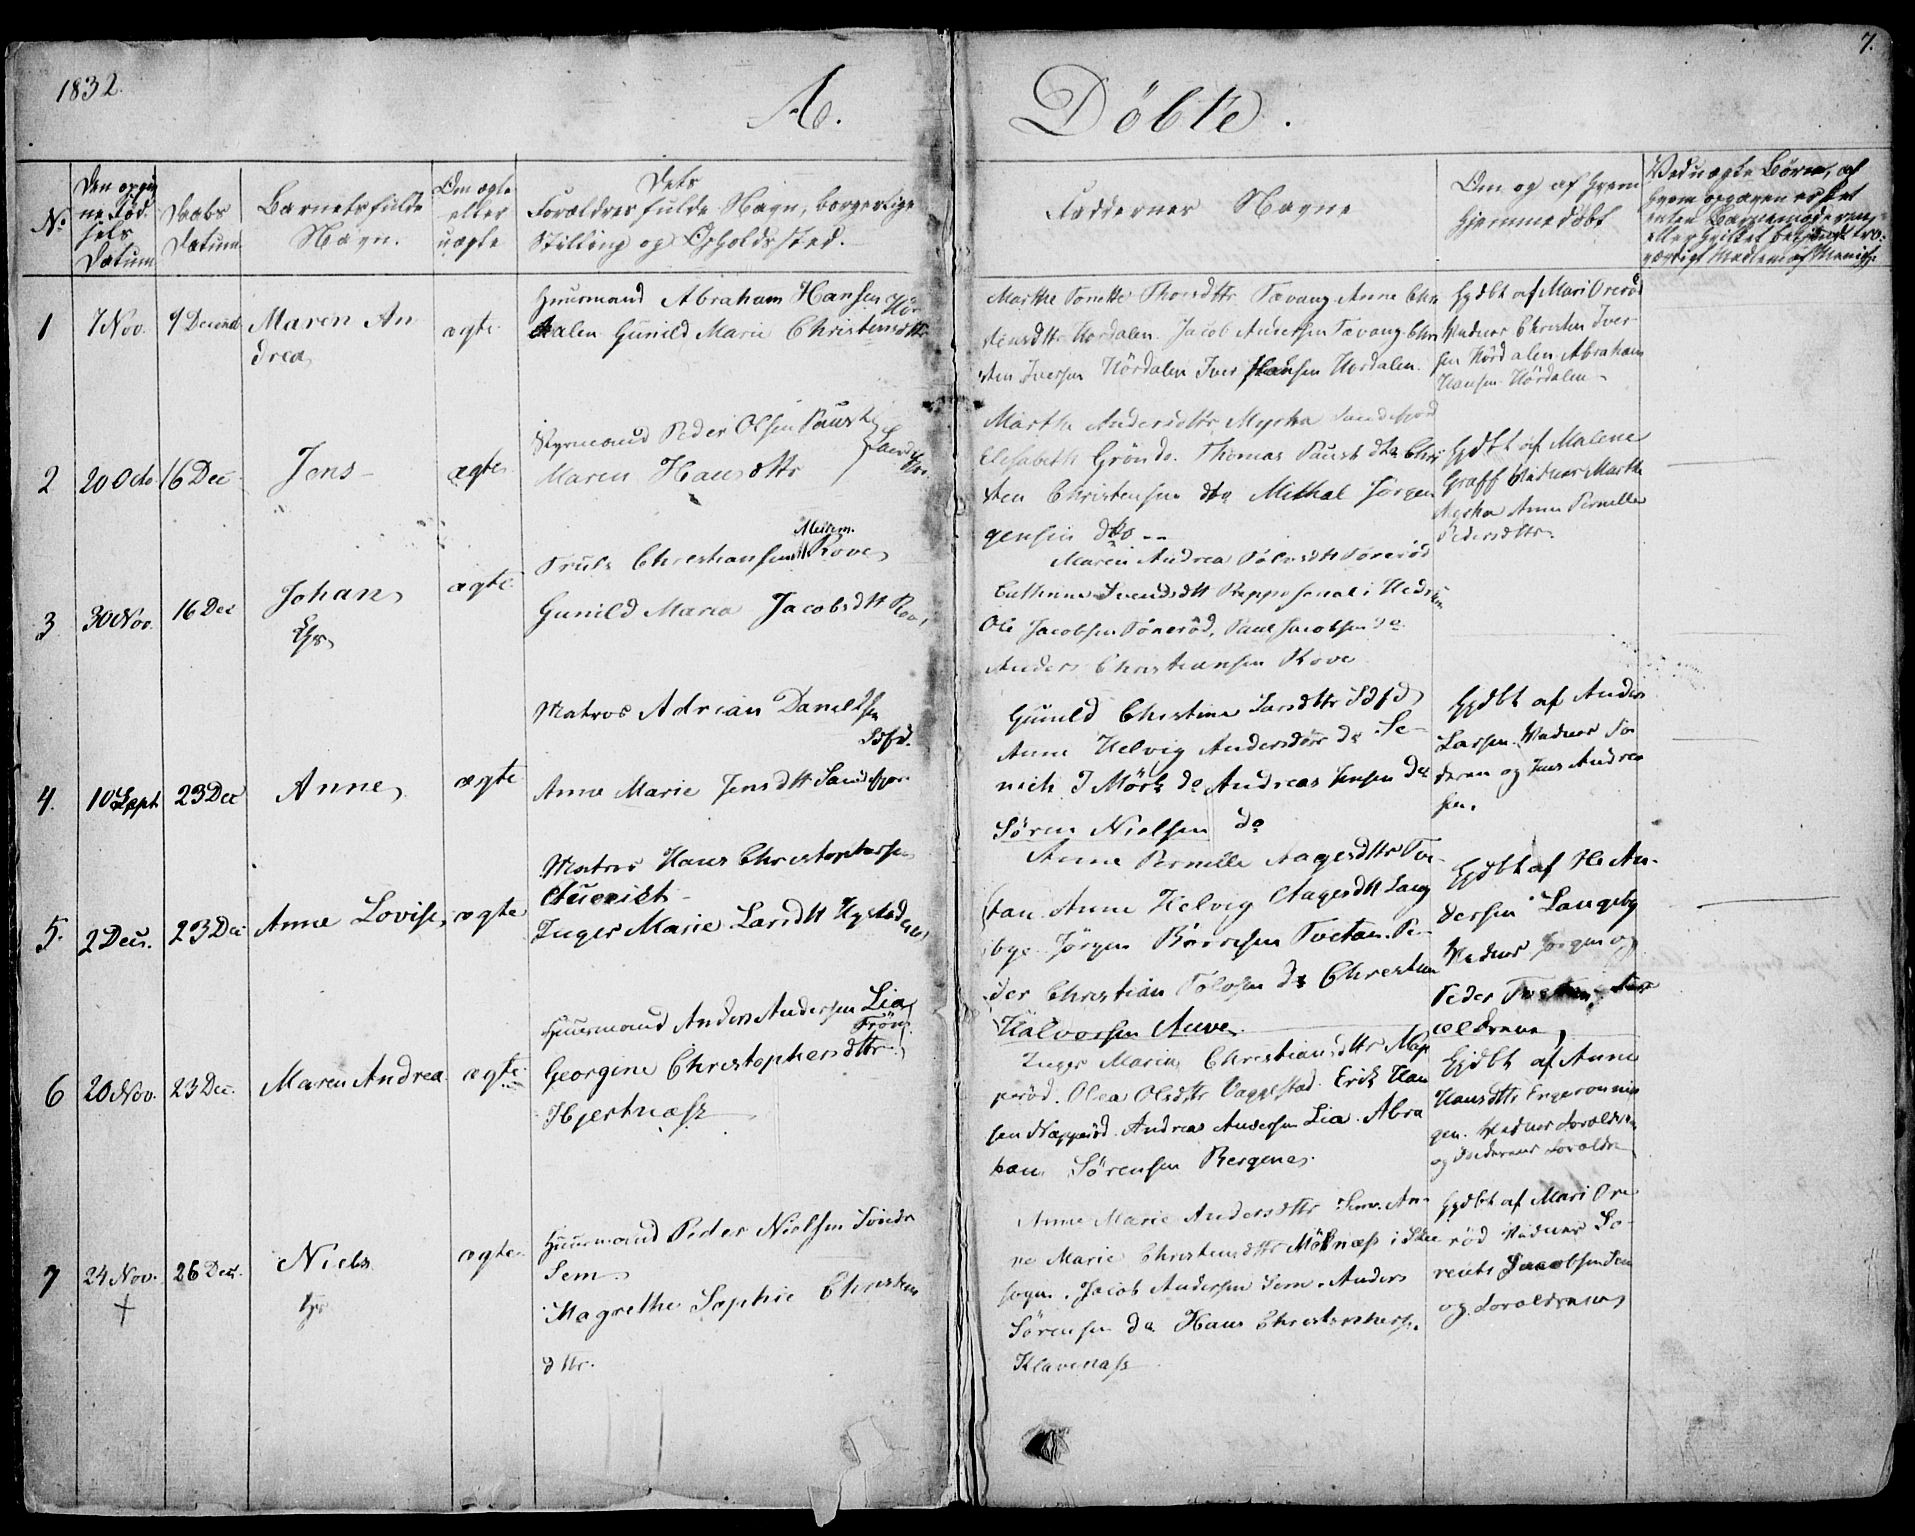 SAKO, Sandar kirkebøker, F/Fa/L0005: Parish register (official) no. 5, 1832-1847, p. 6-7